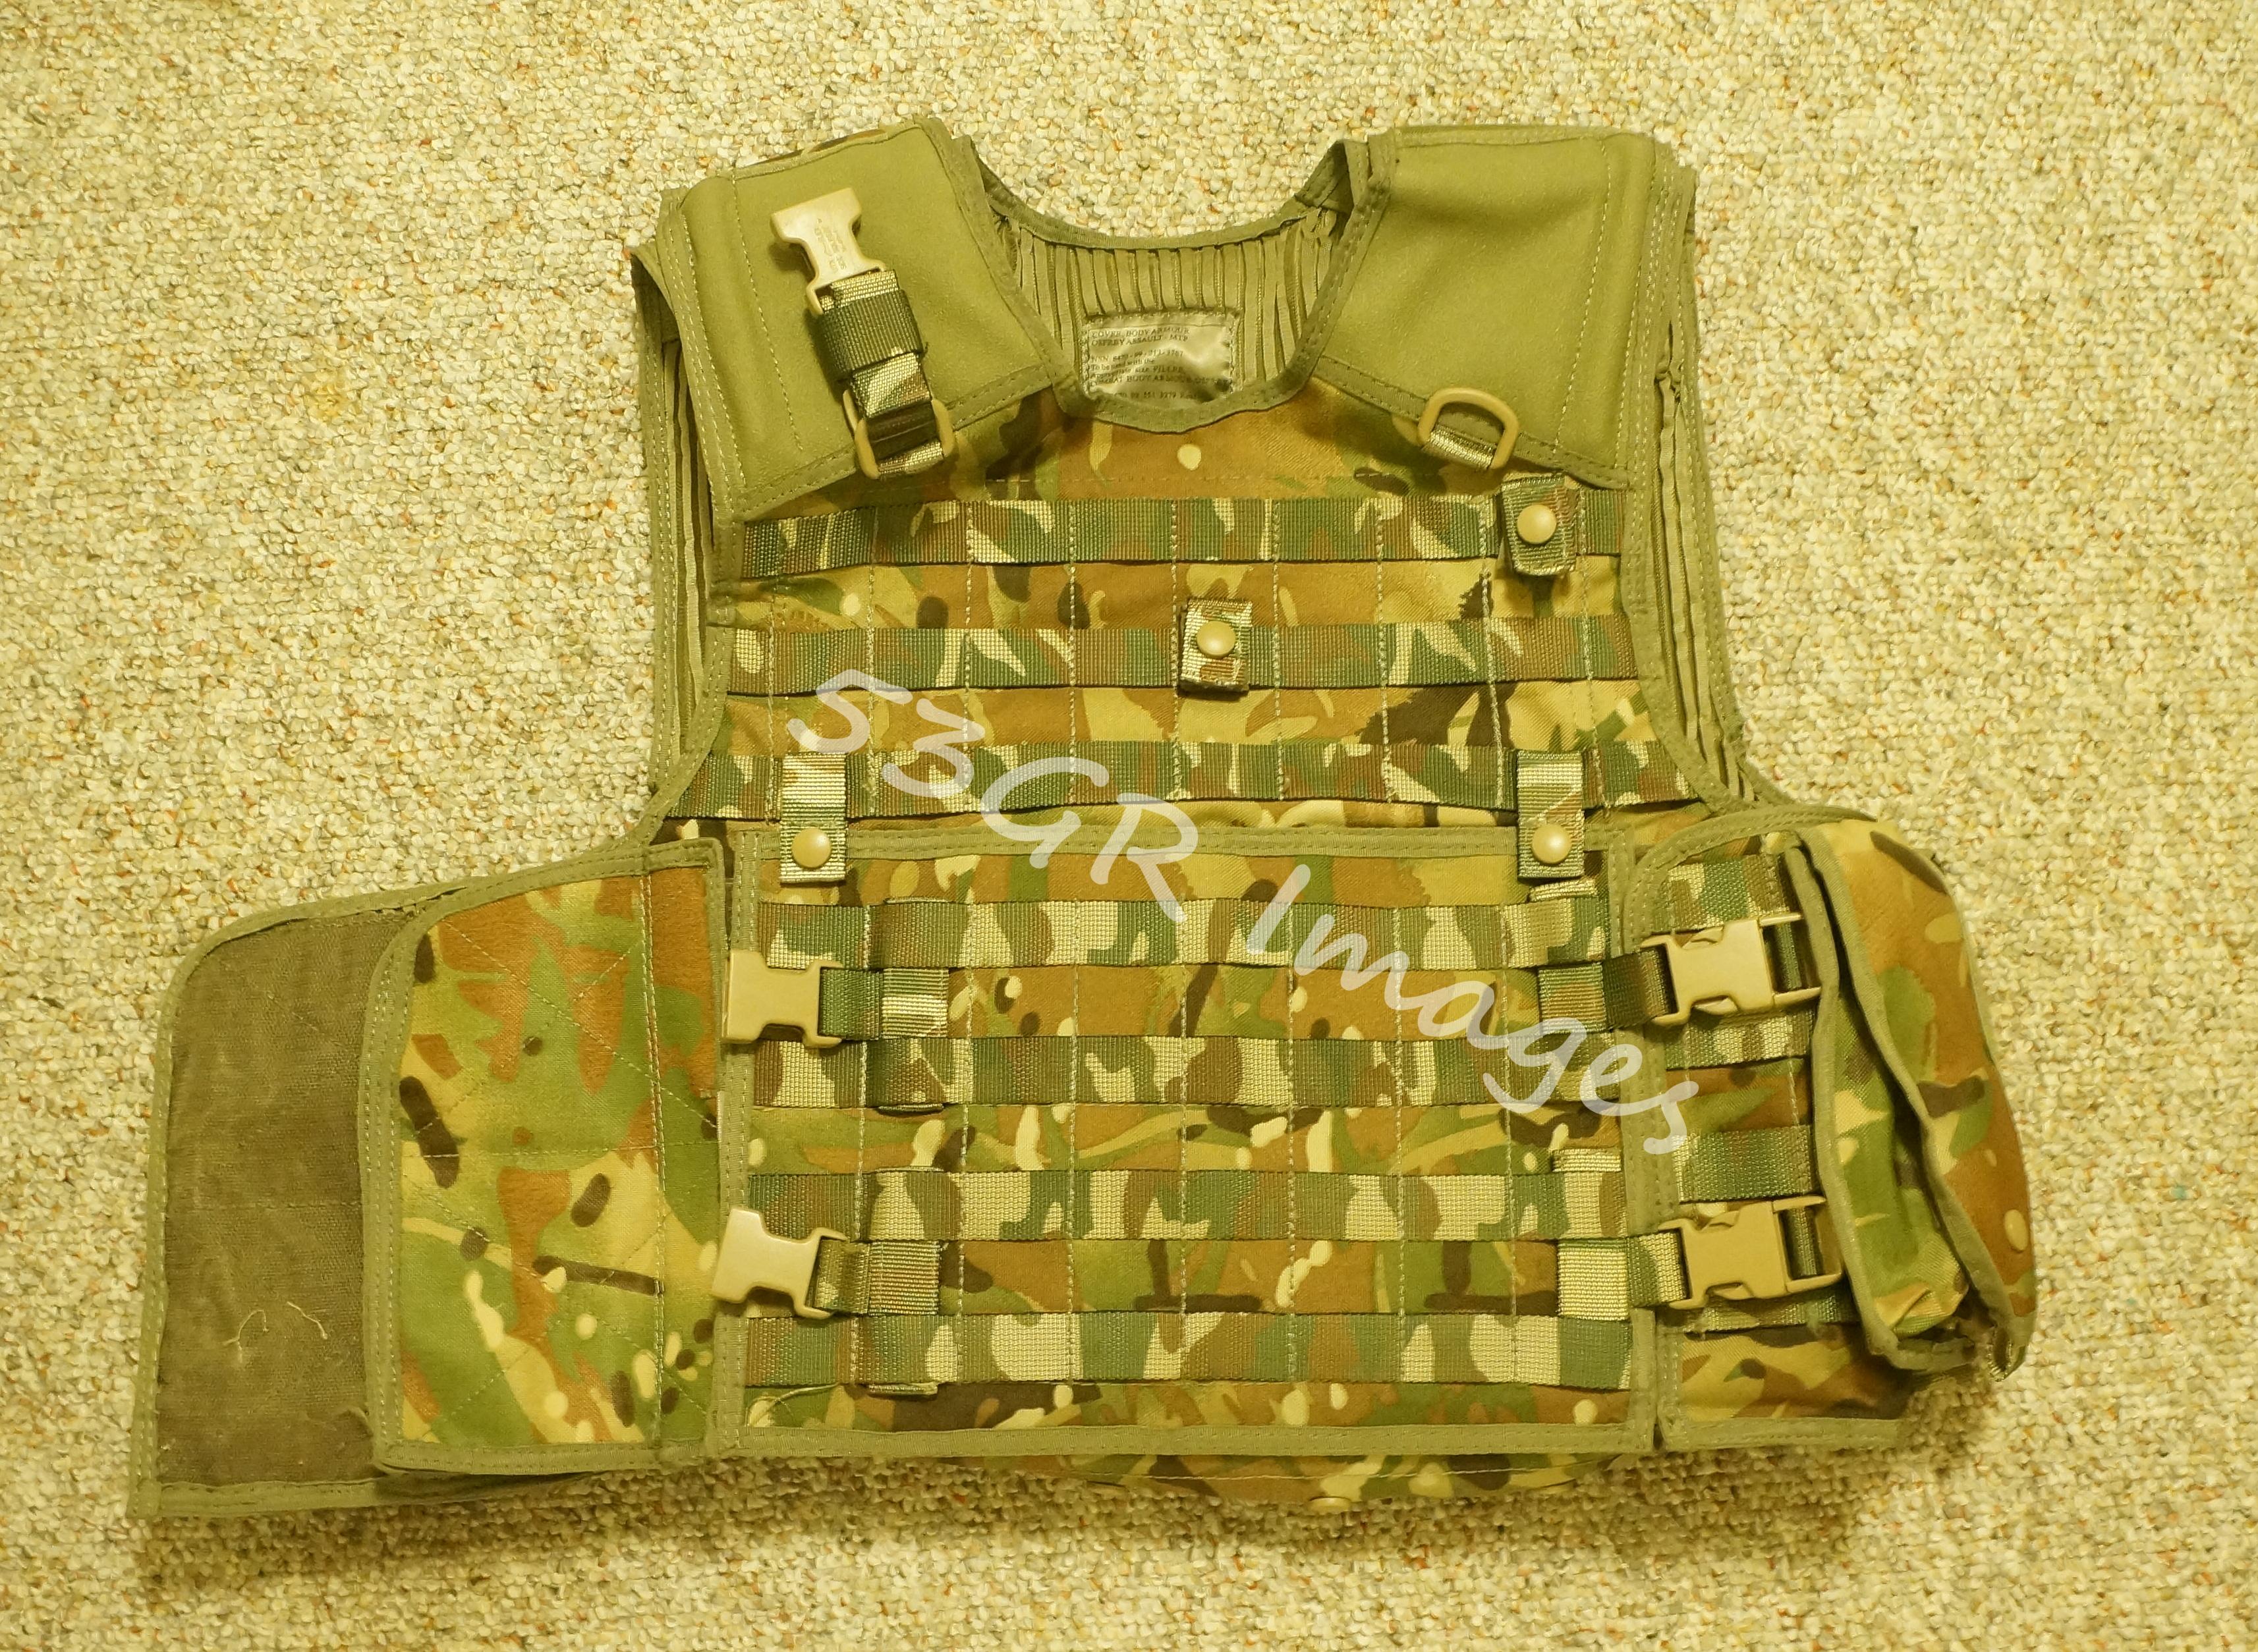 Osprey MK4 Armor Carrier